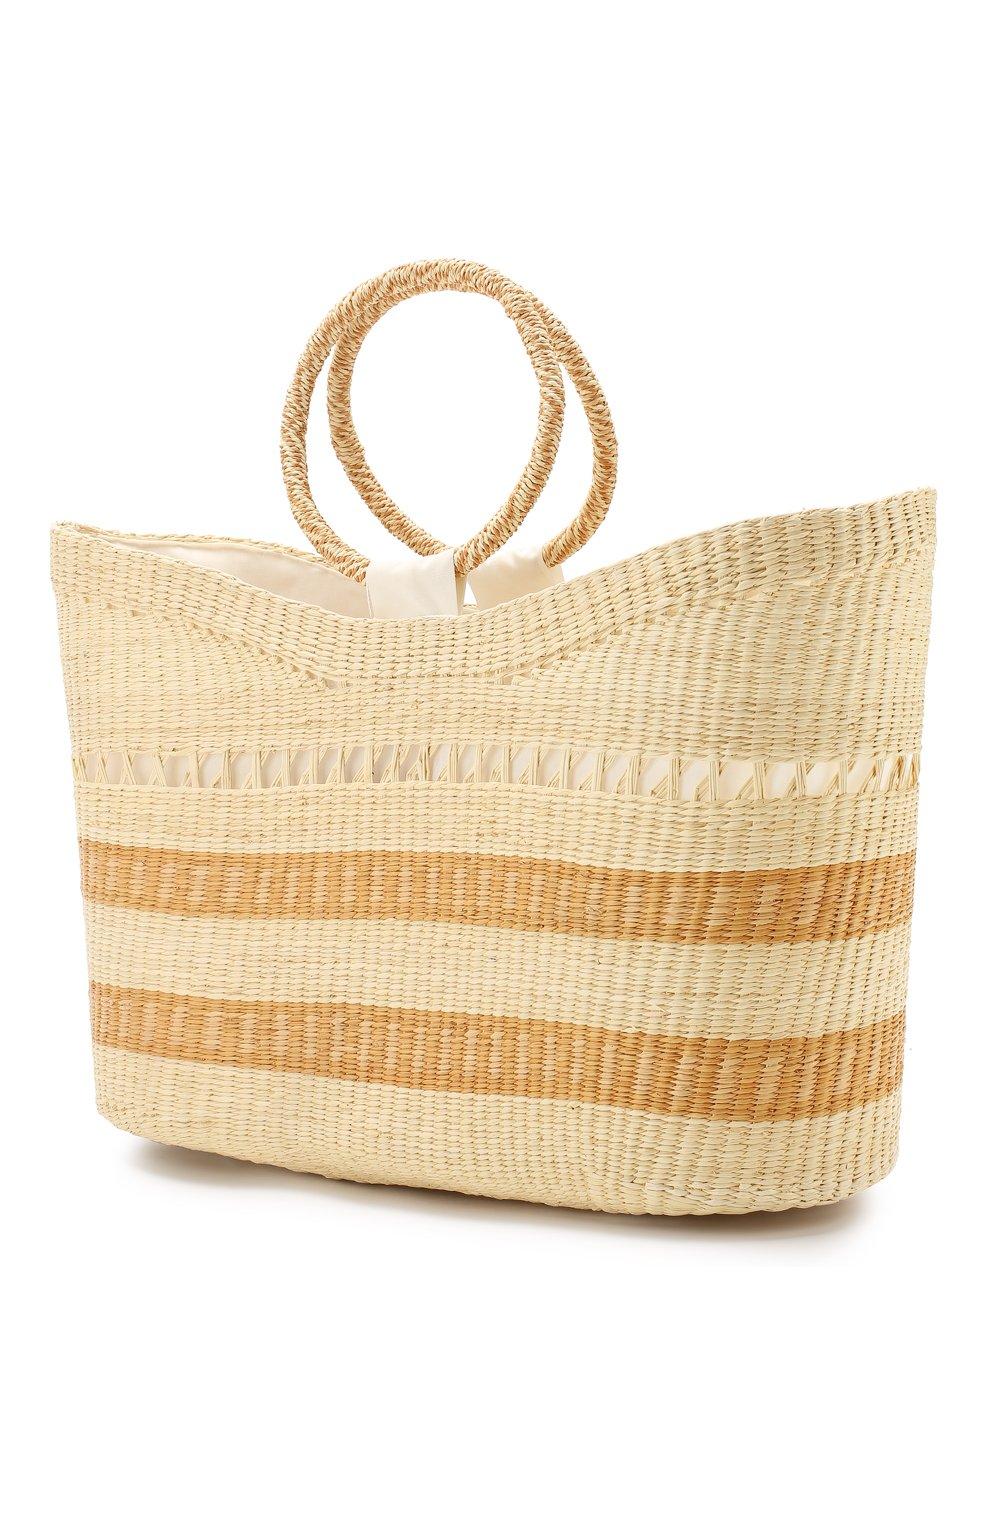 26849db3d4b7c Пляжная сумка SENSI STUDIO светло-бежевого цвета — купить за 21500 ...